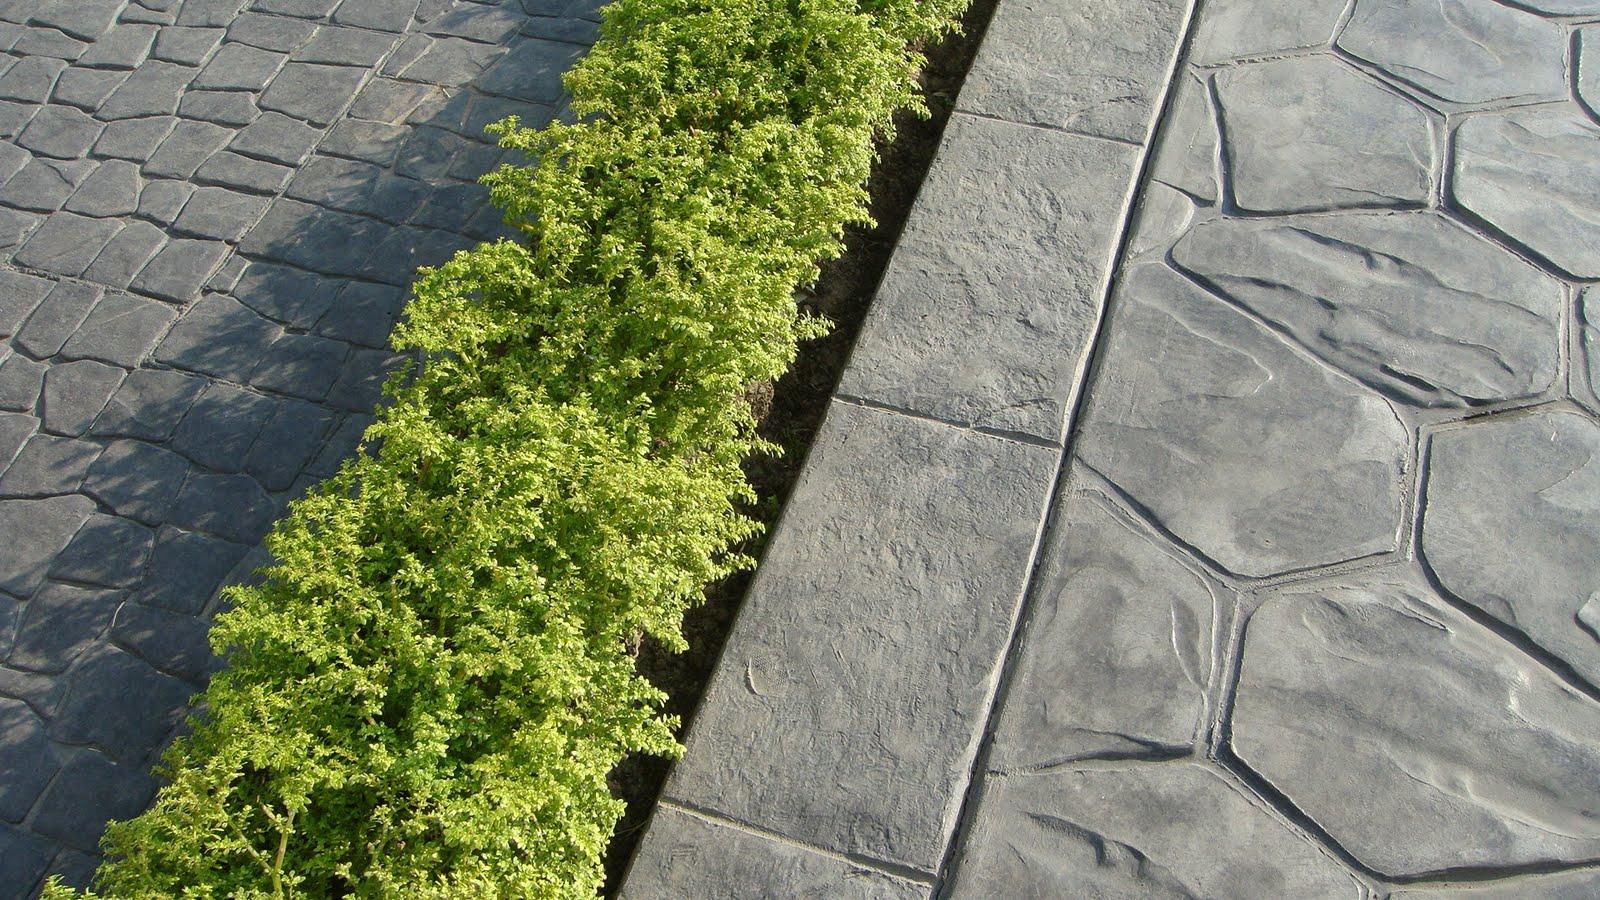 Oniria concreto estampado decorativo for Cemento pulido costo